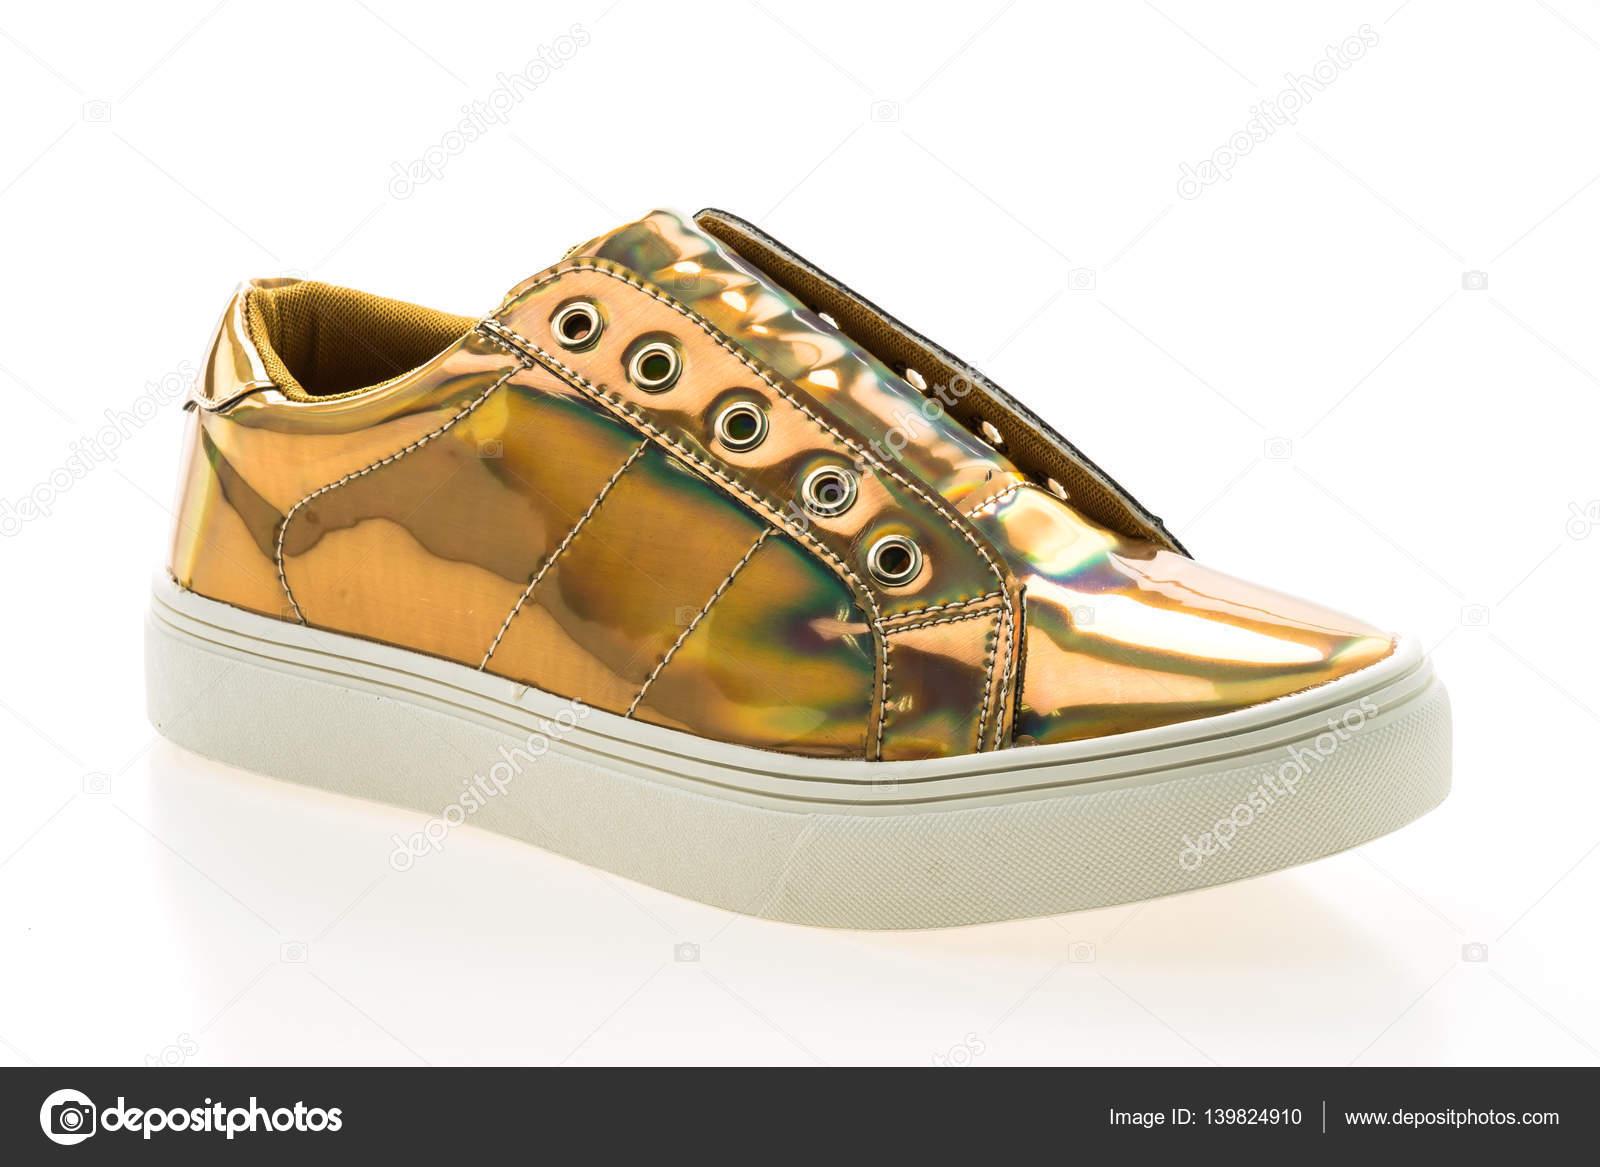 c638fea4624 Παπούτσια μόδας και ύπουλος — Φωτογραφία Αρχείου © mrsiraphol #139824910